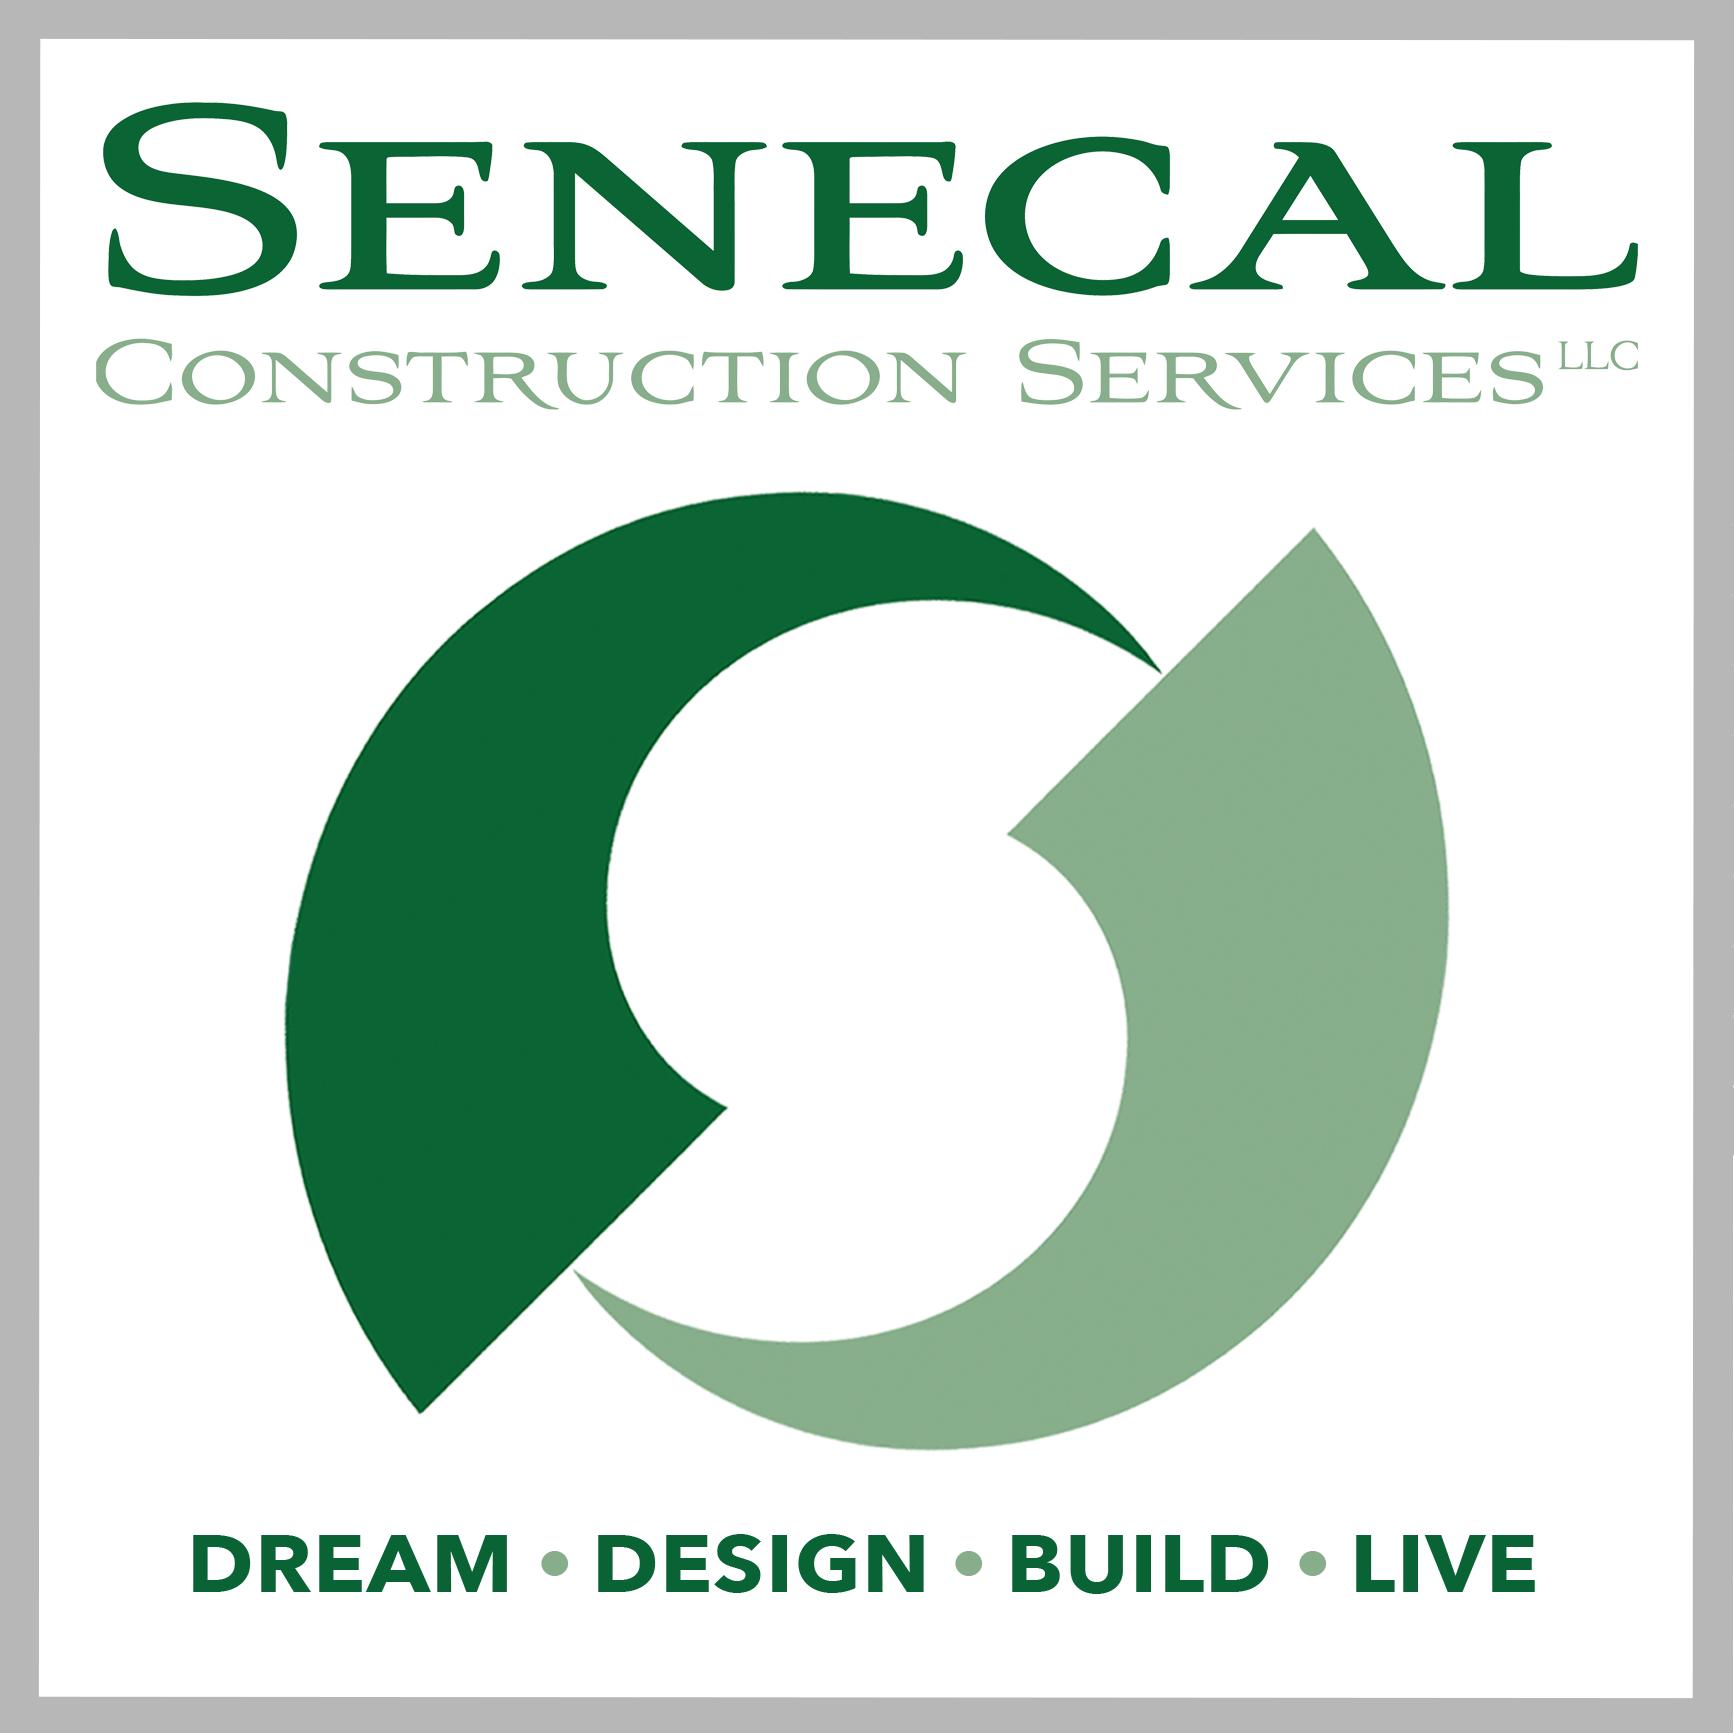 senecal_option 2_square_SCS_FINAL.png